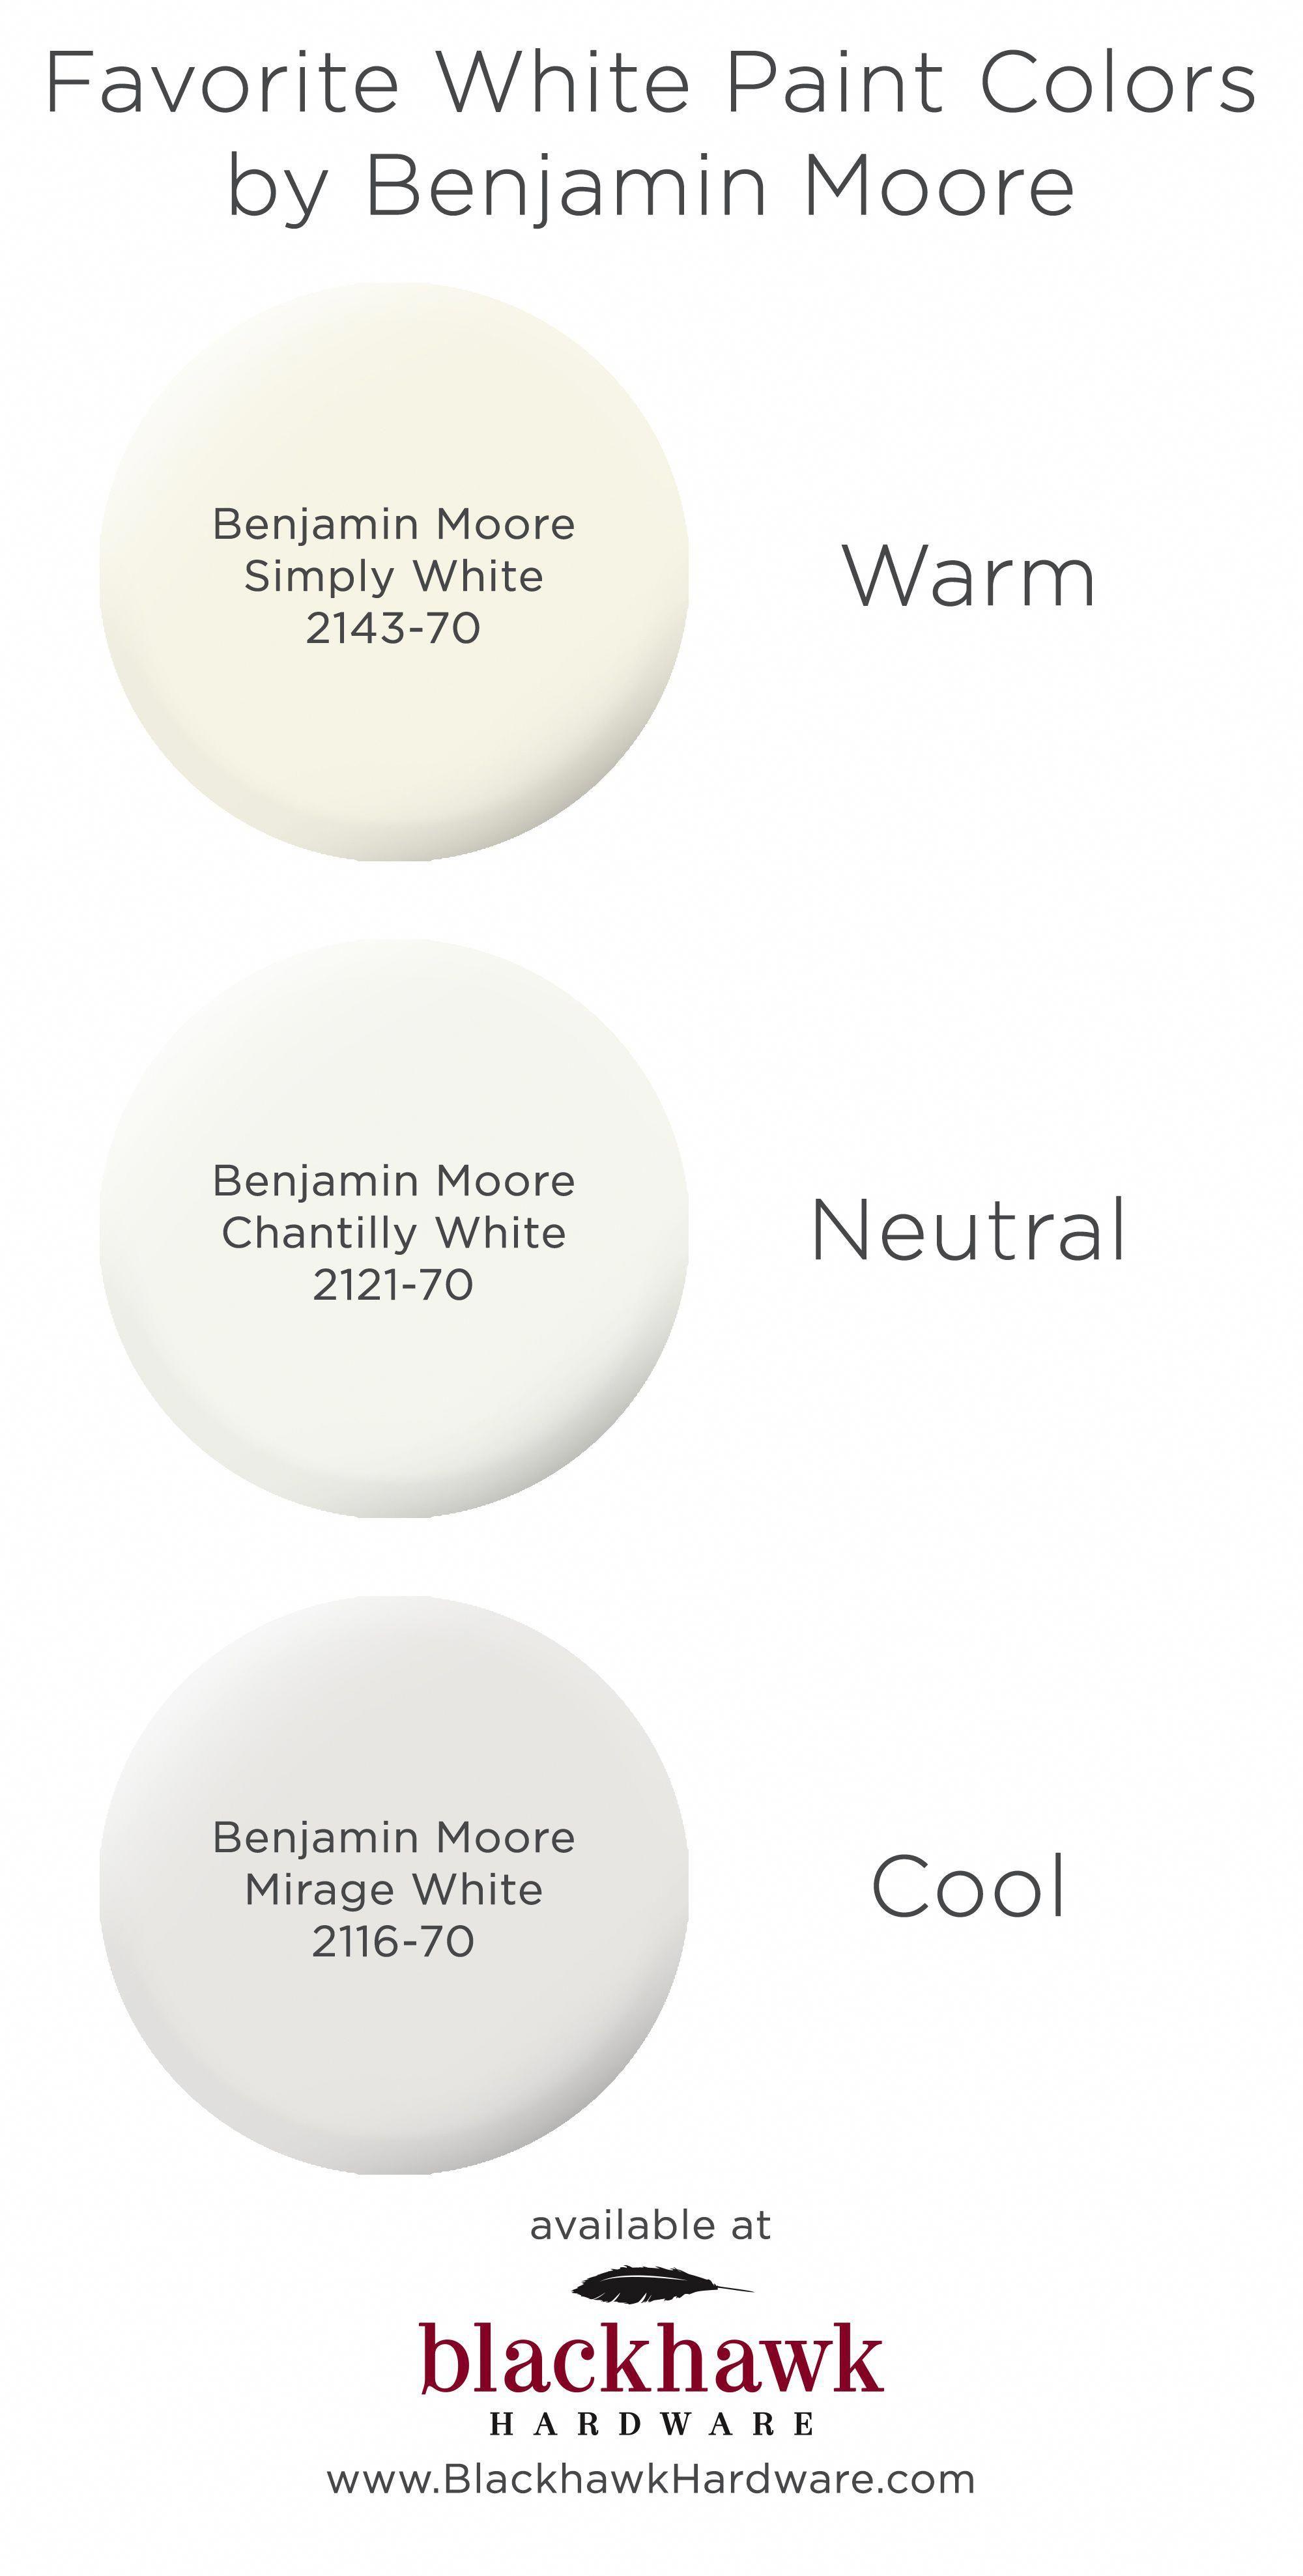 8 Dream Beds For Children White Paint Colors Best White Paint